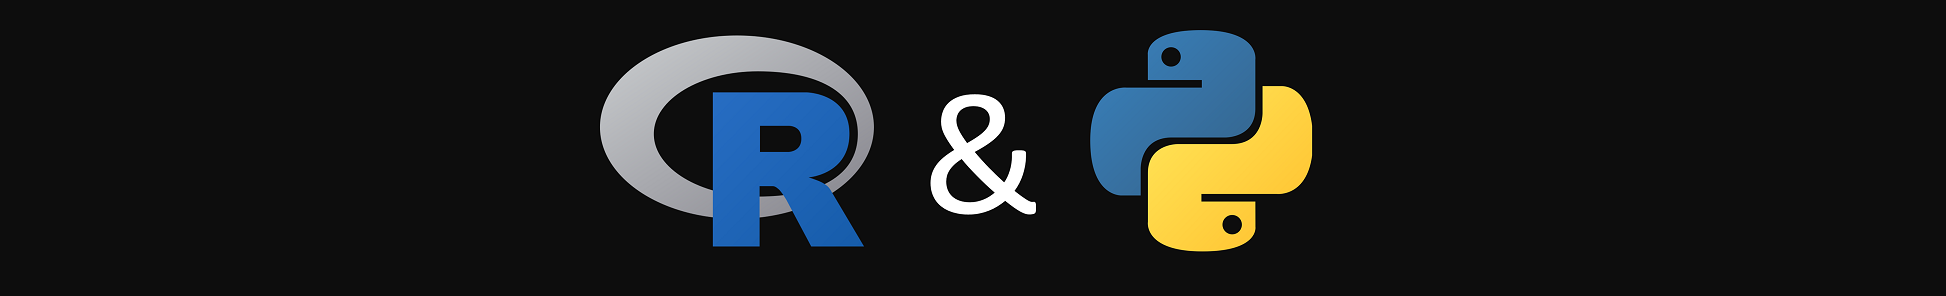 R and Python Logo - Top 10 Data Analytics Tools - Edureka